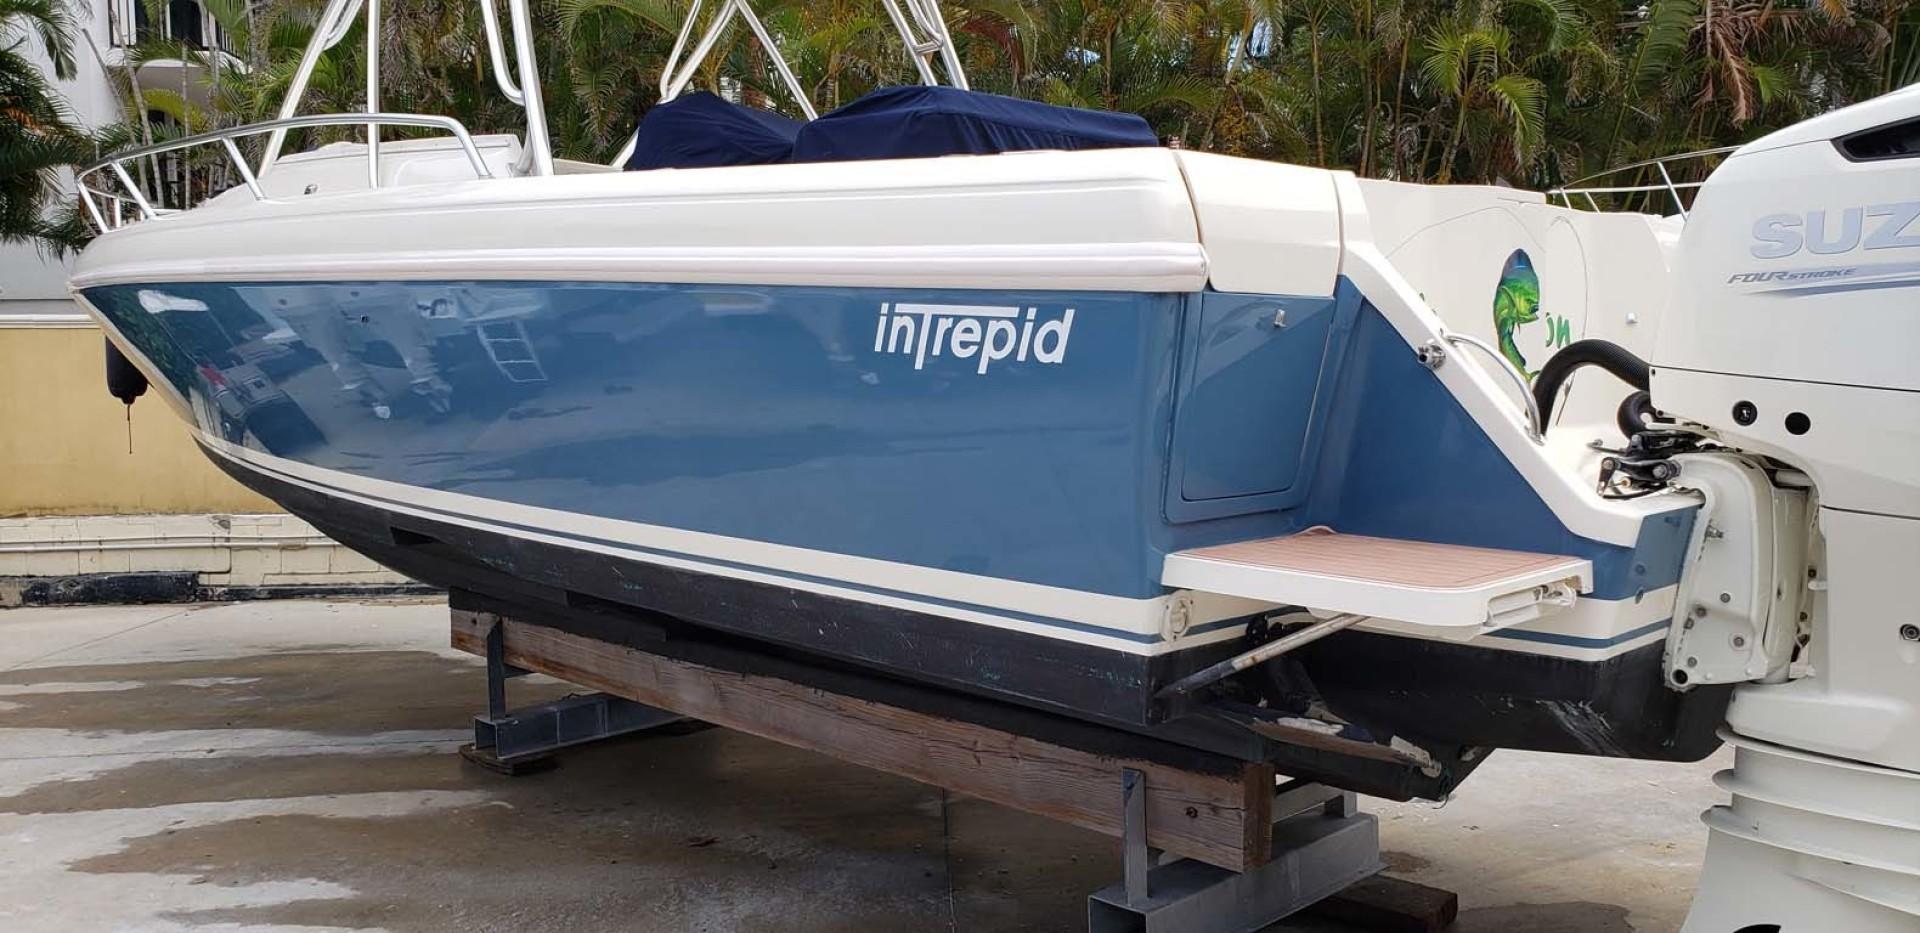 Intrepid-348 Walkaround 2003 -West Palm Beach-Florida-United States-1428855 | Thumbnail